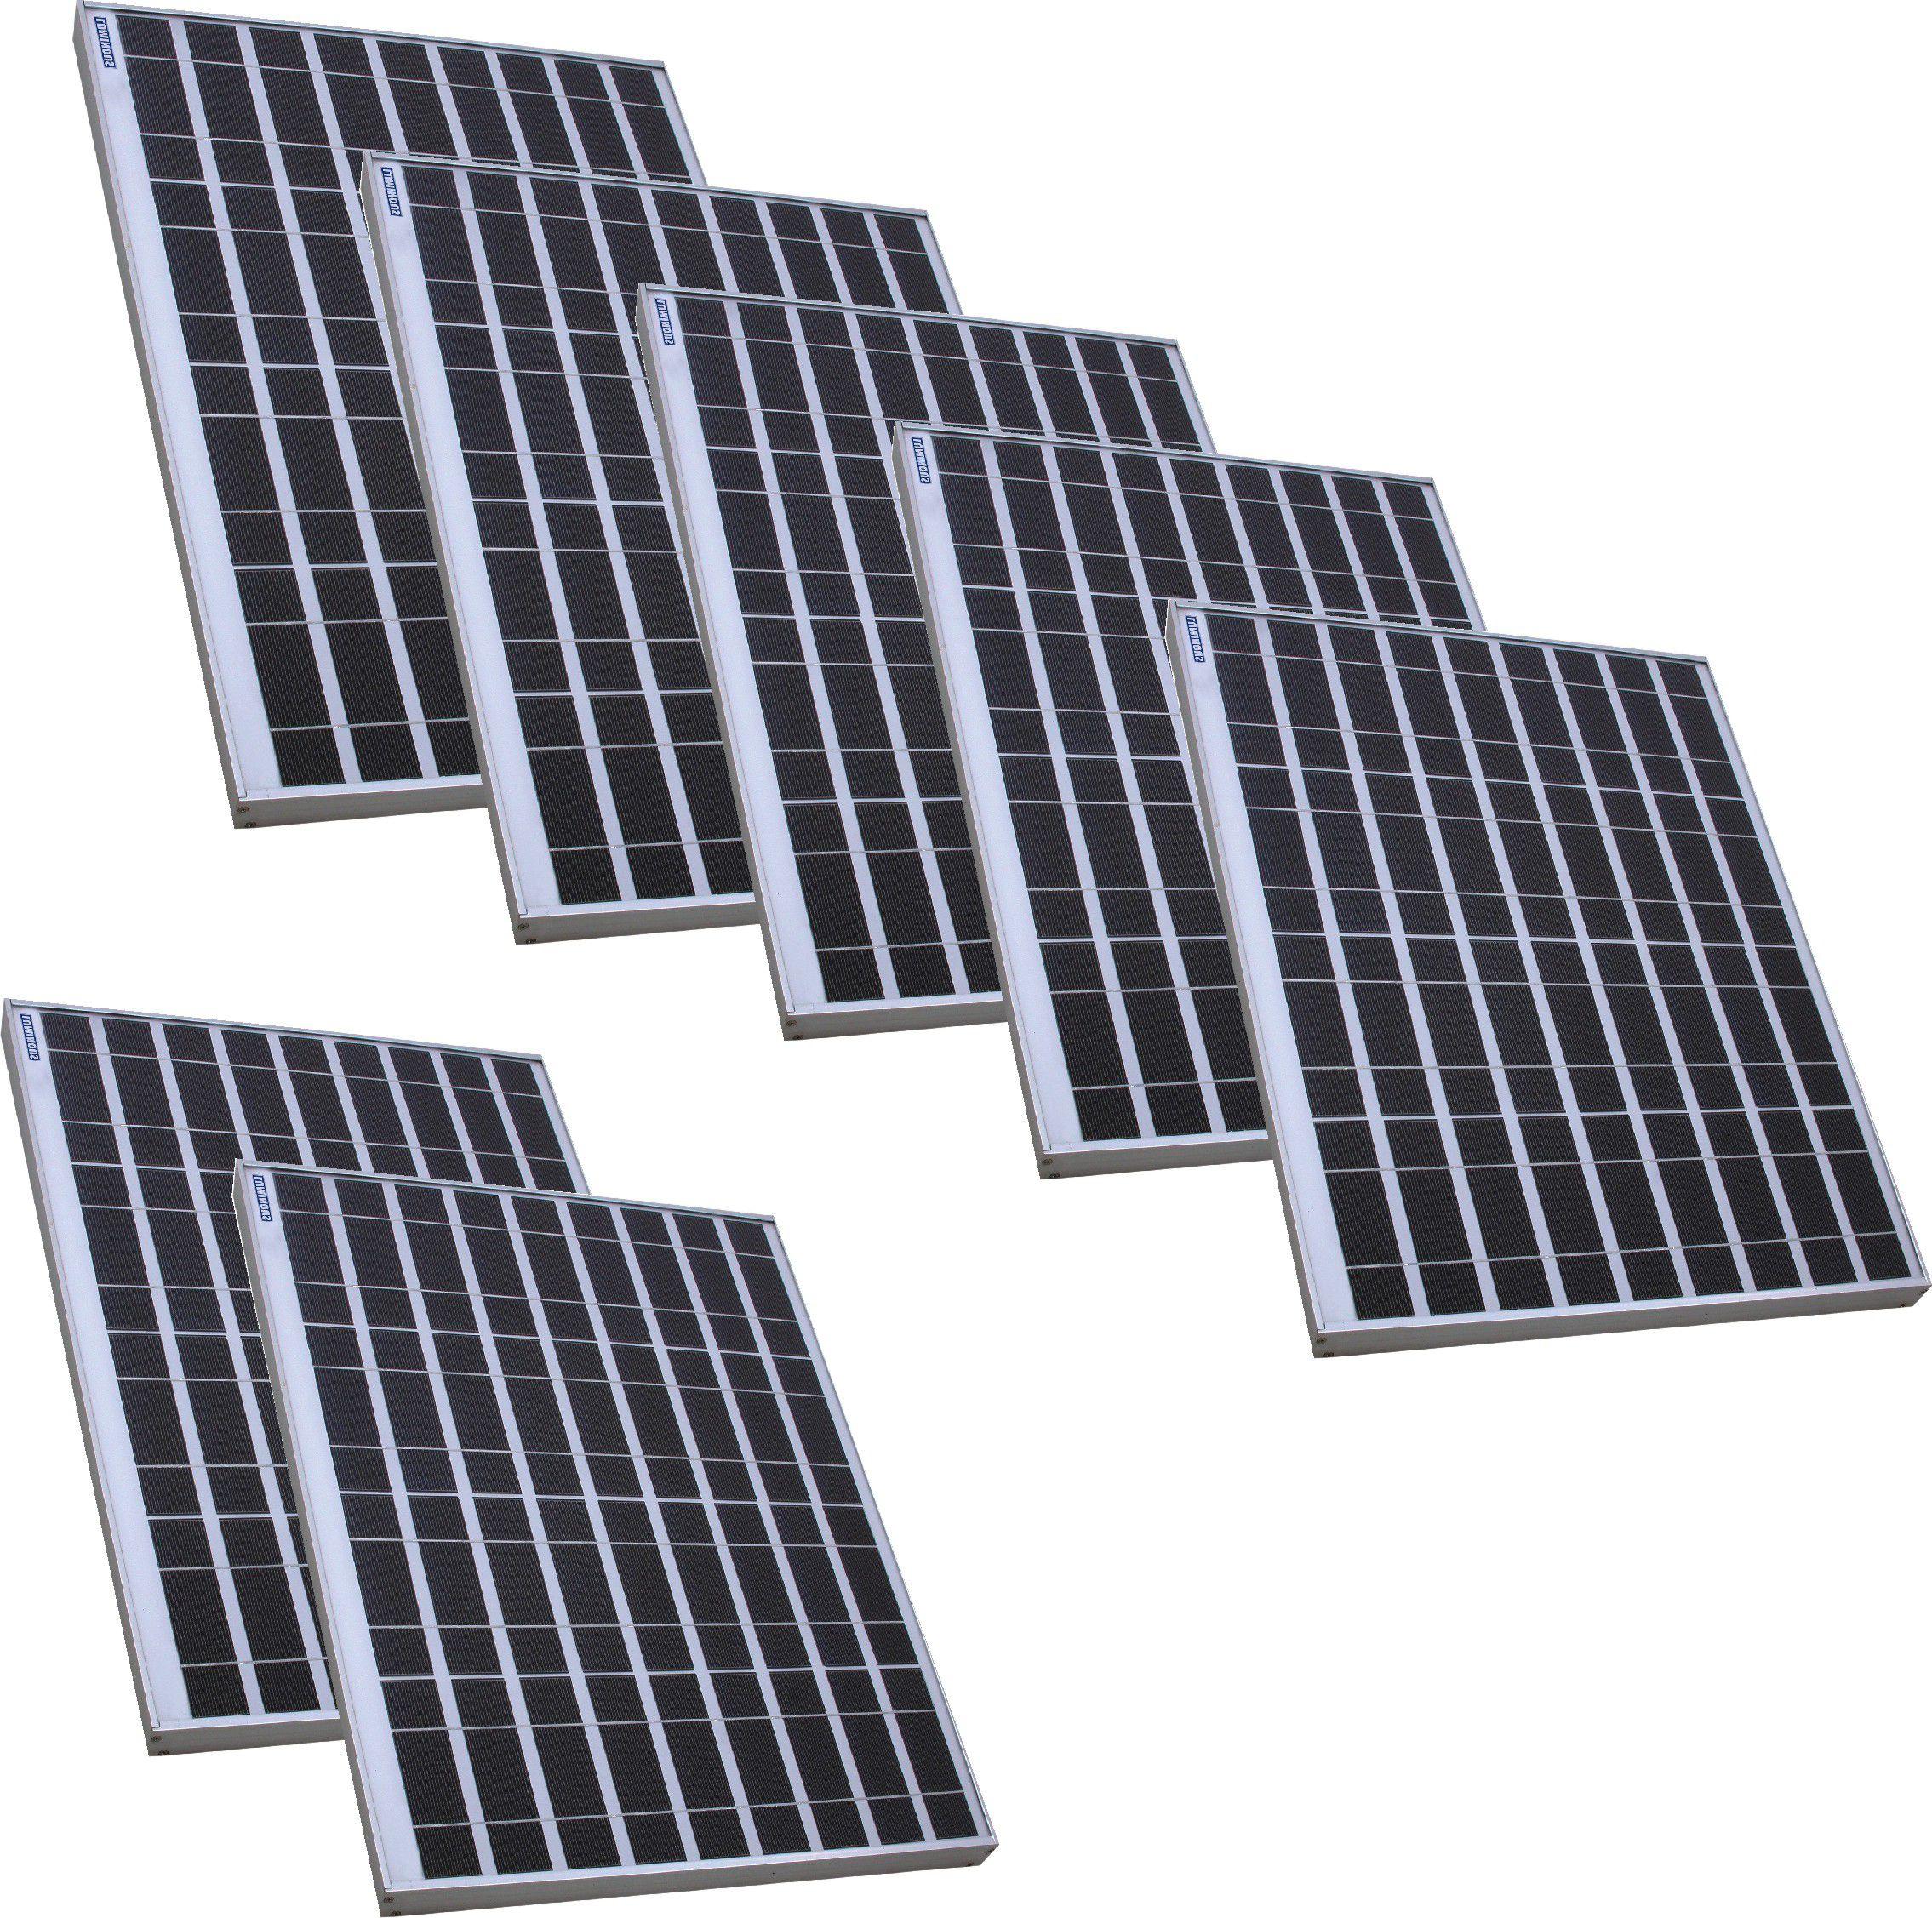 Luminous Solar Panel 10W 12V SDL094618682 1 c1823 Top Result 50 Inspirational Portable solar Panels Image 2018 Hdj5